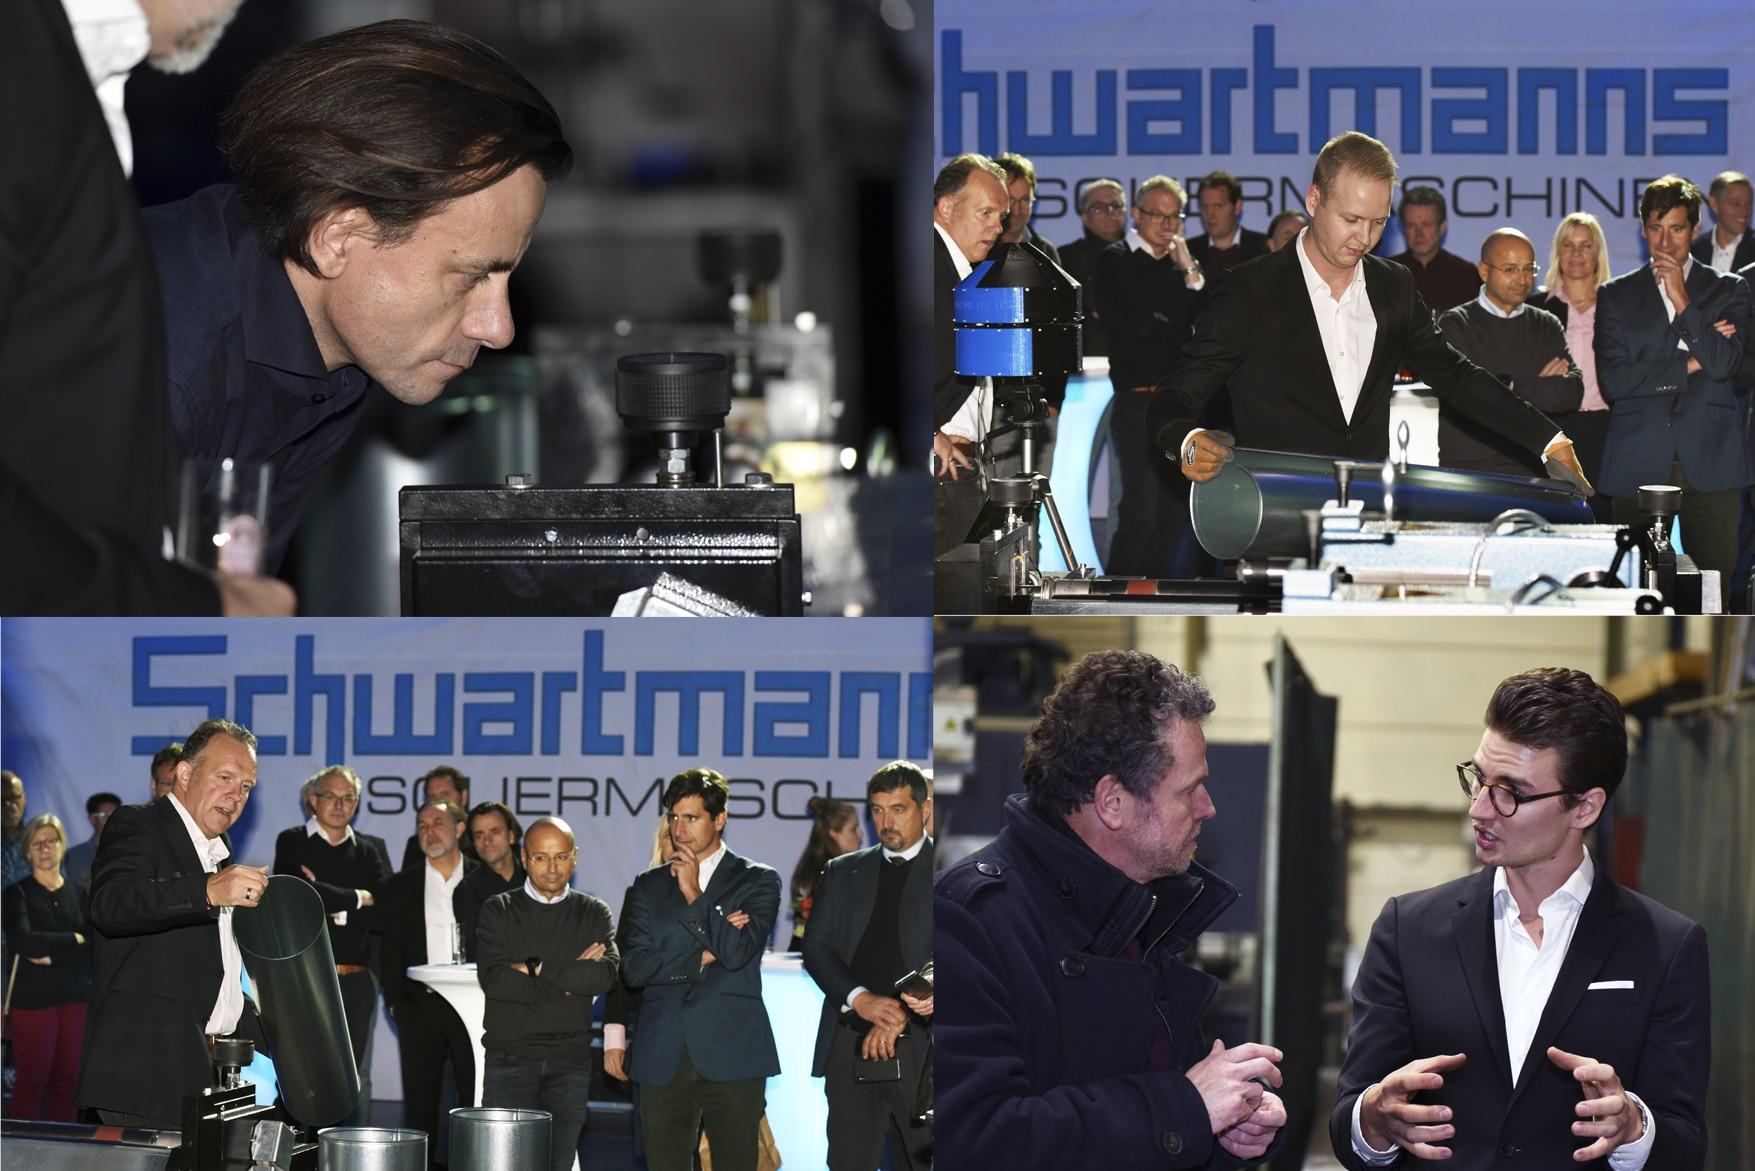 EiiF Meeting 2019 collage